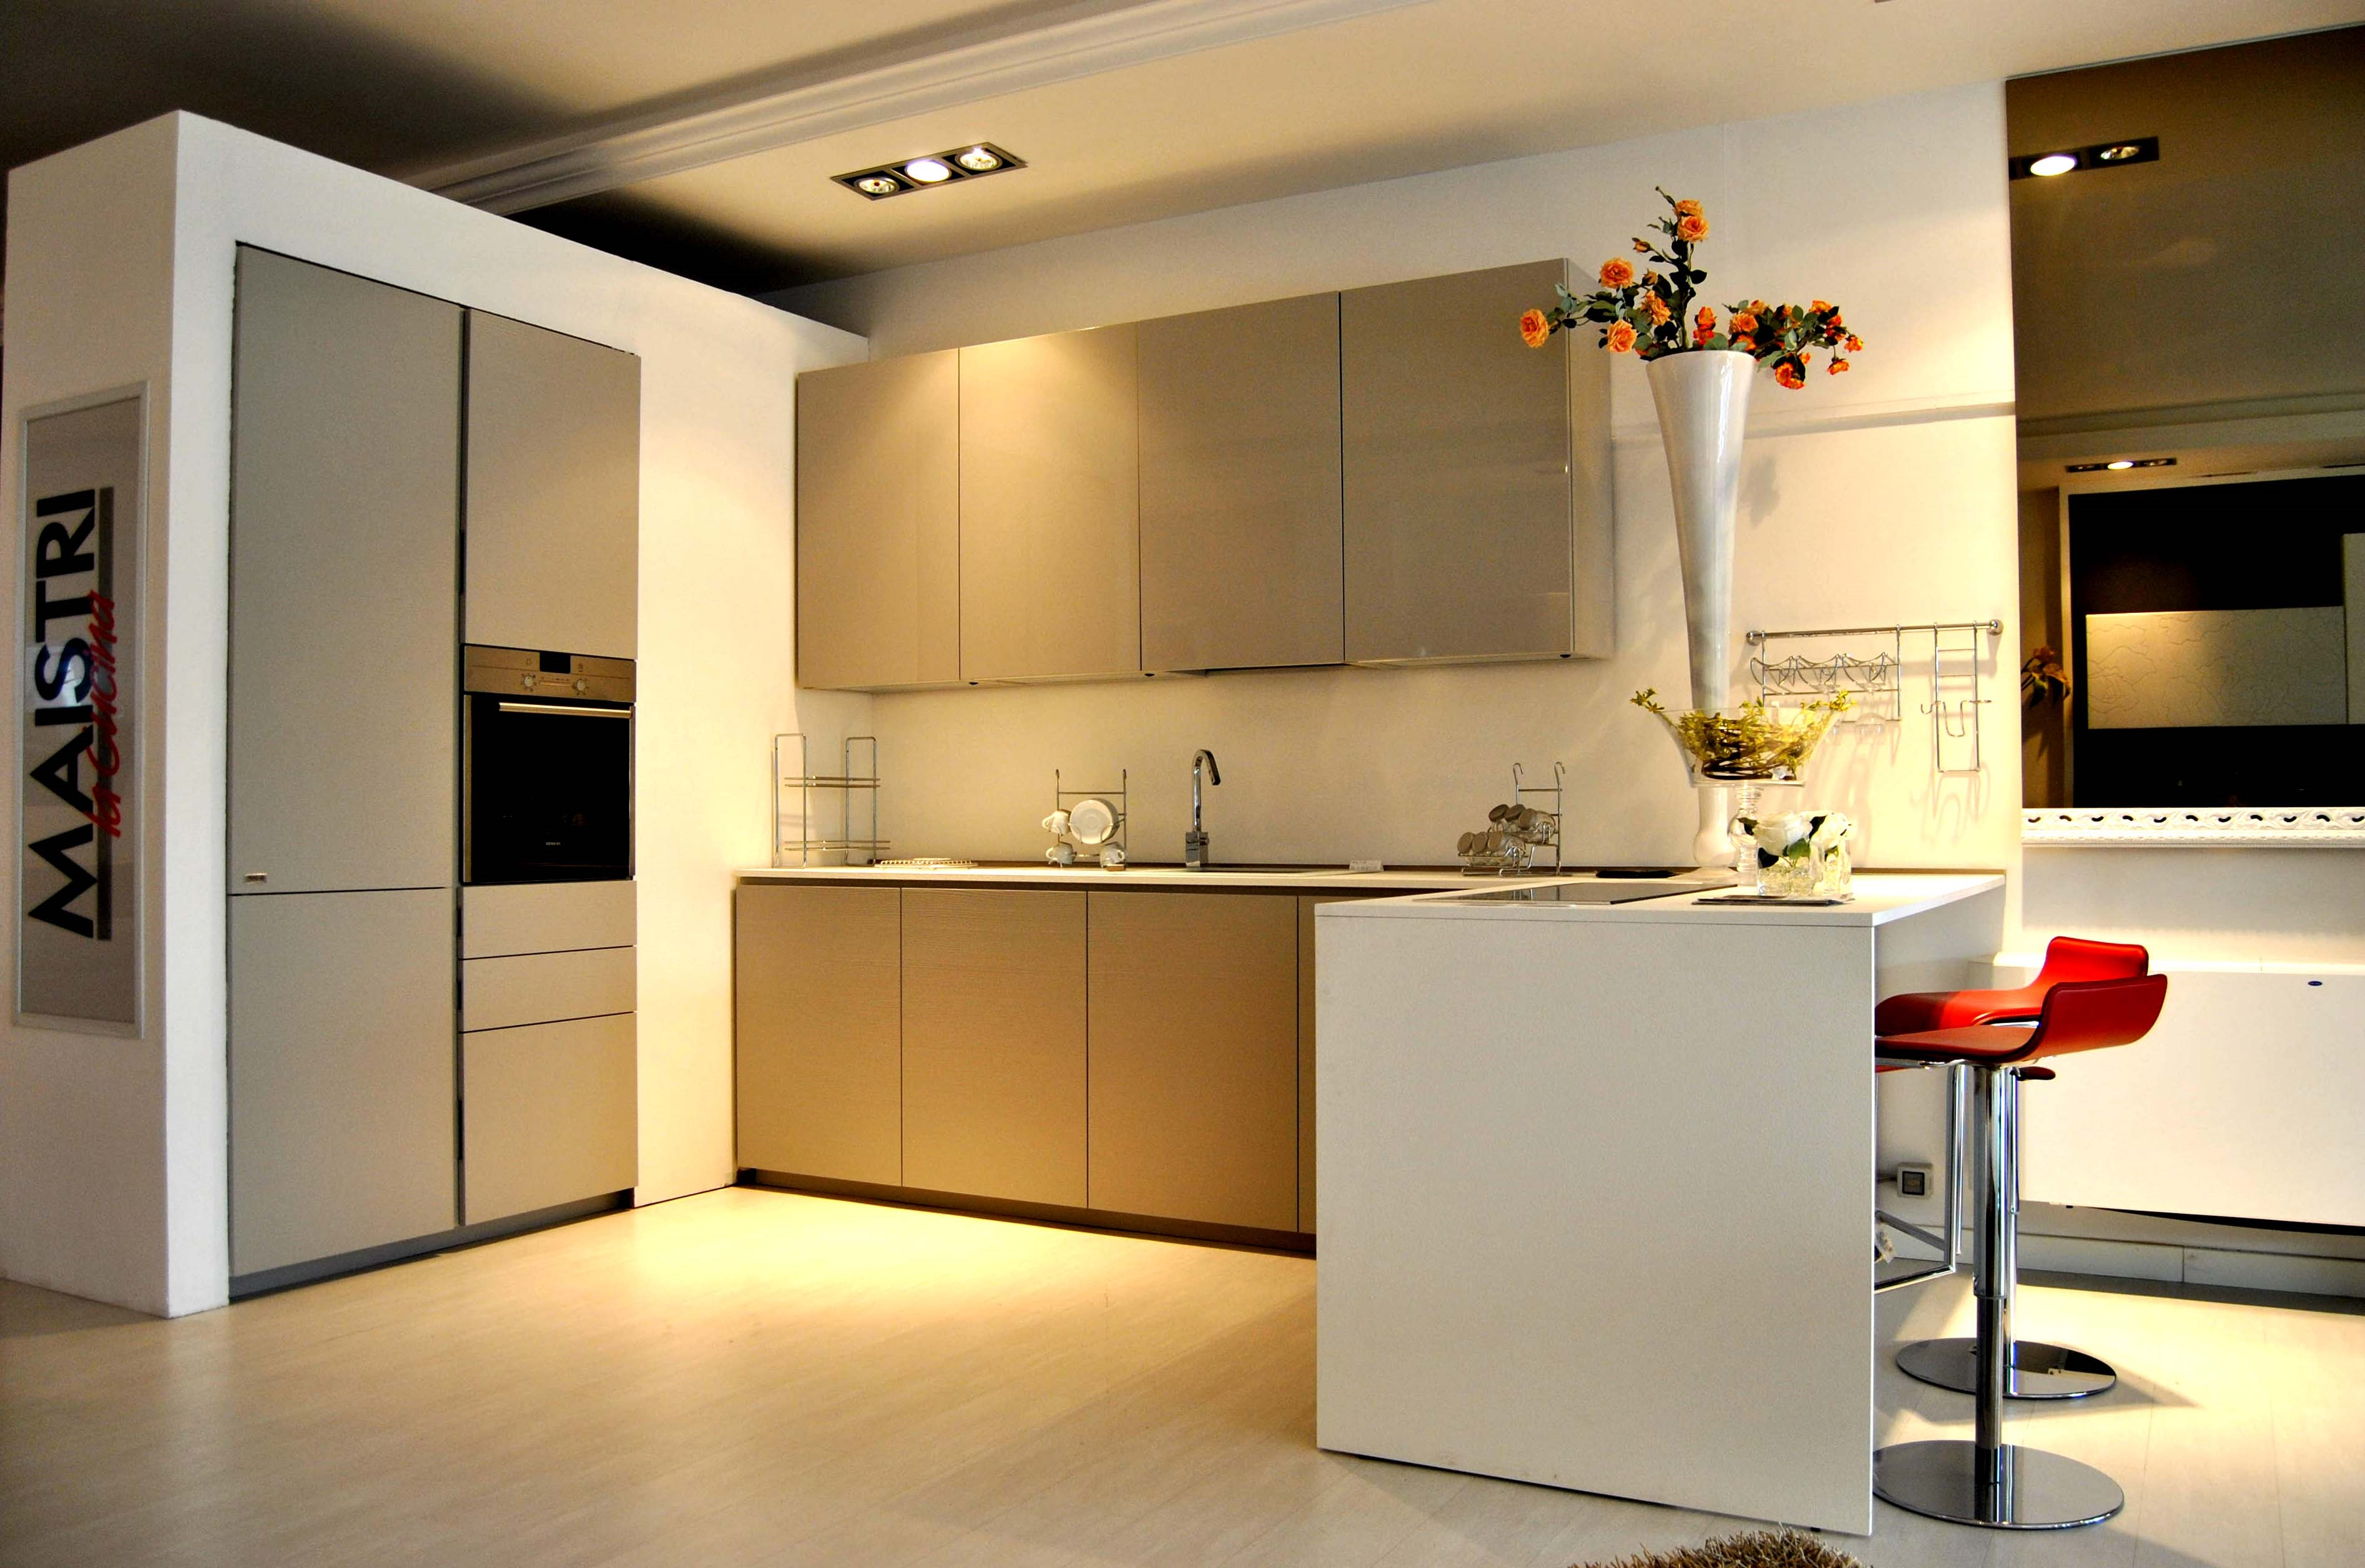 cucina maistri cucine viva scontato del -43 % - cucine a prezzi ... - Cucina Maistri